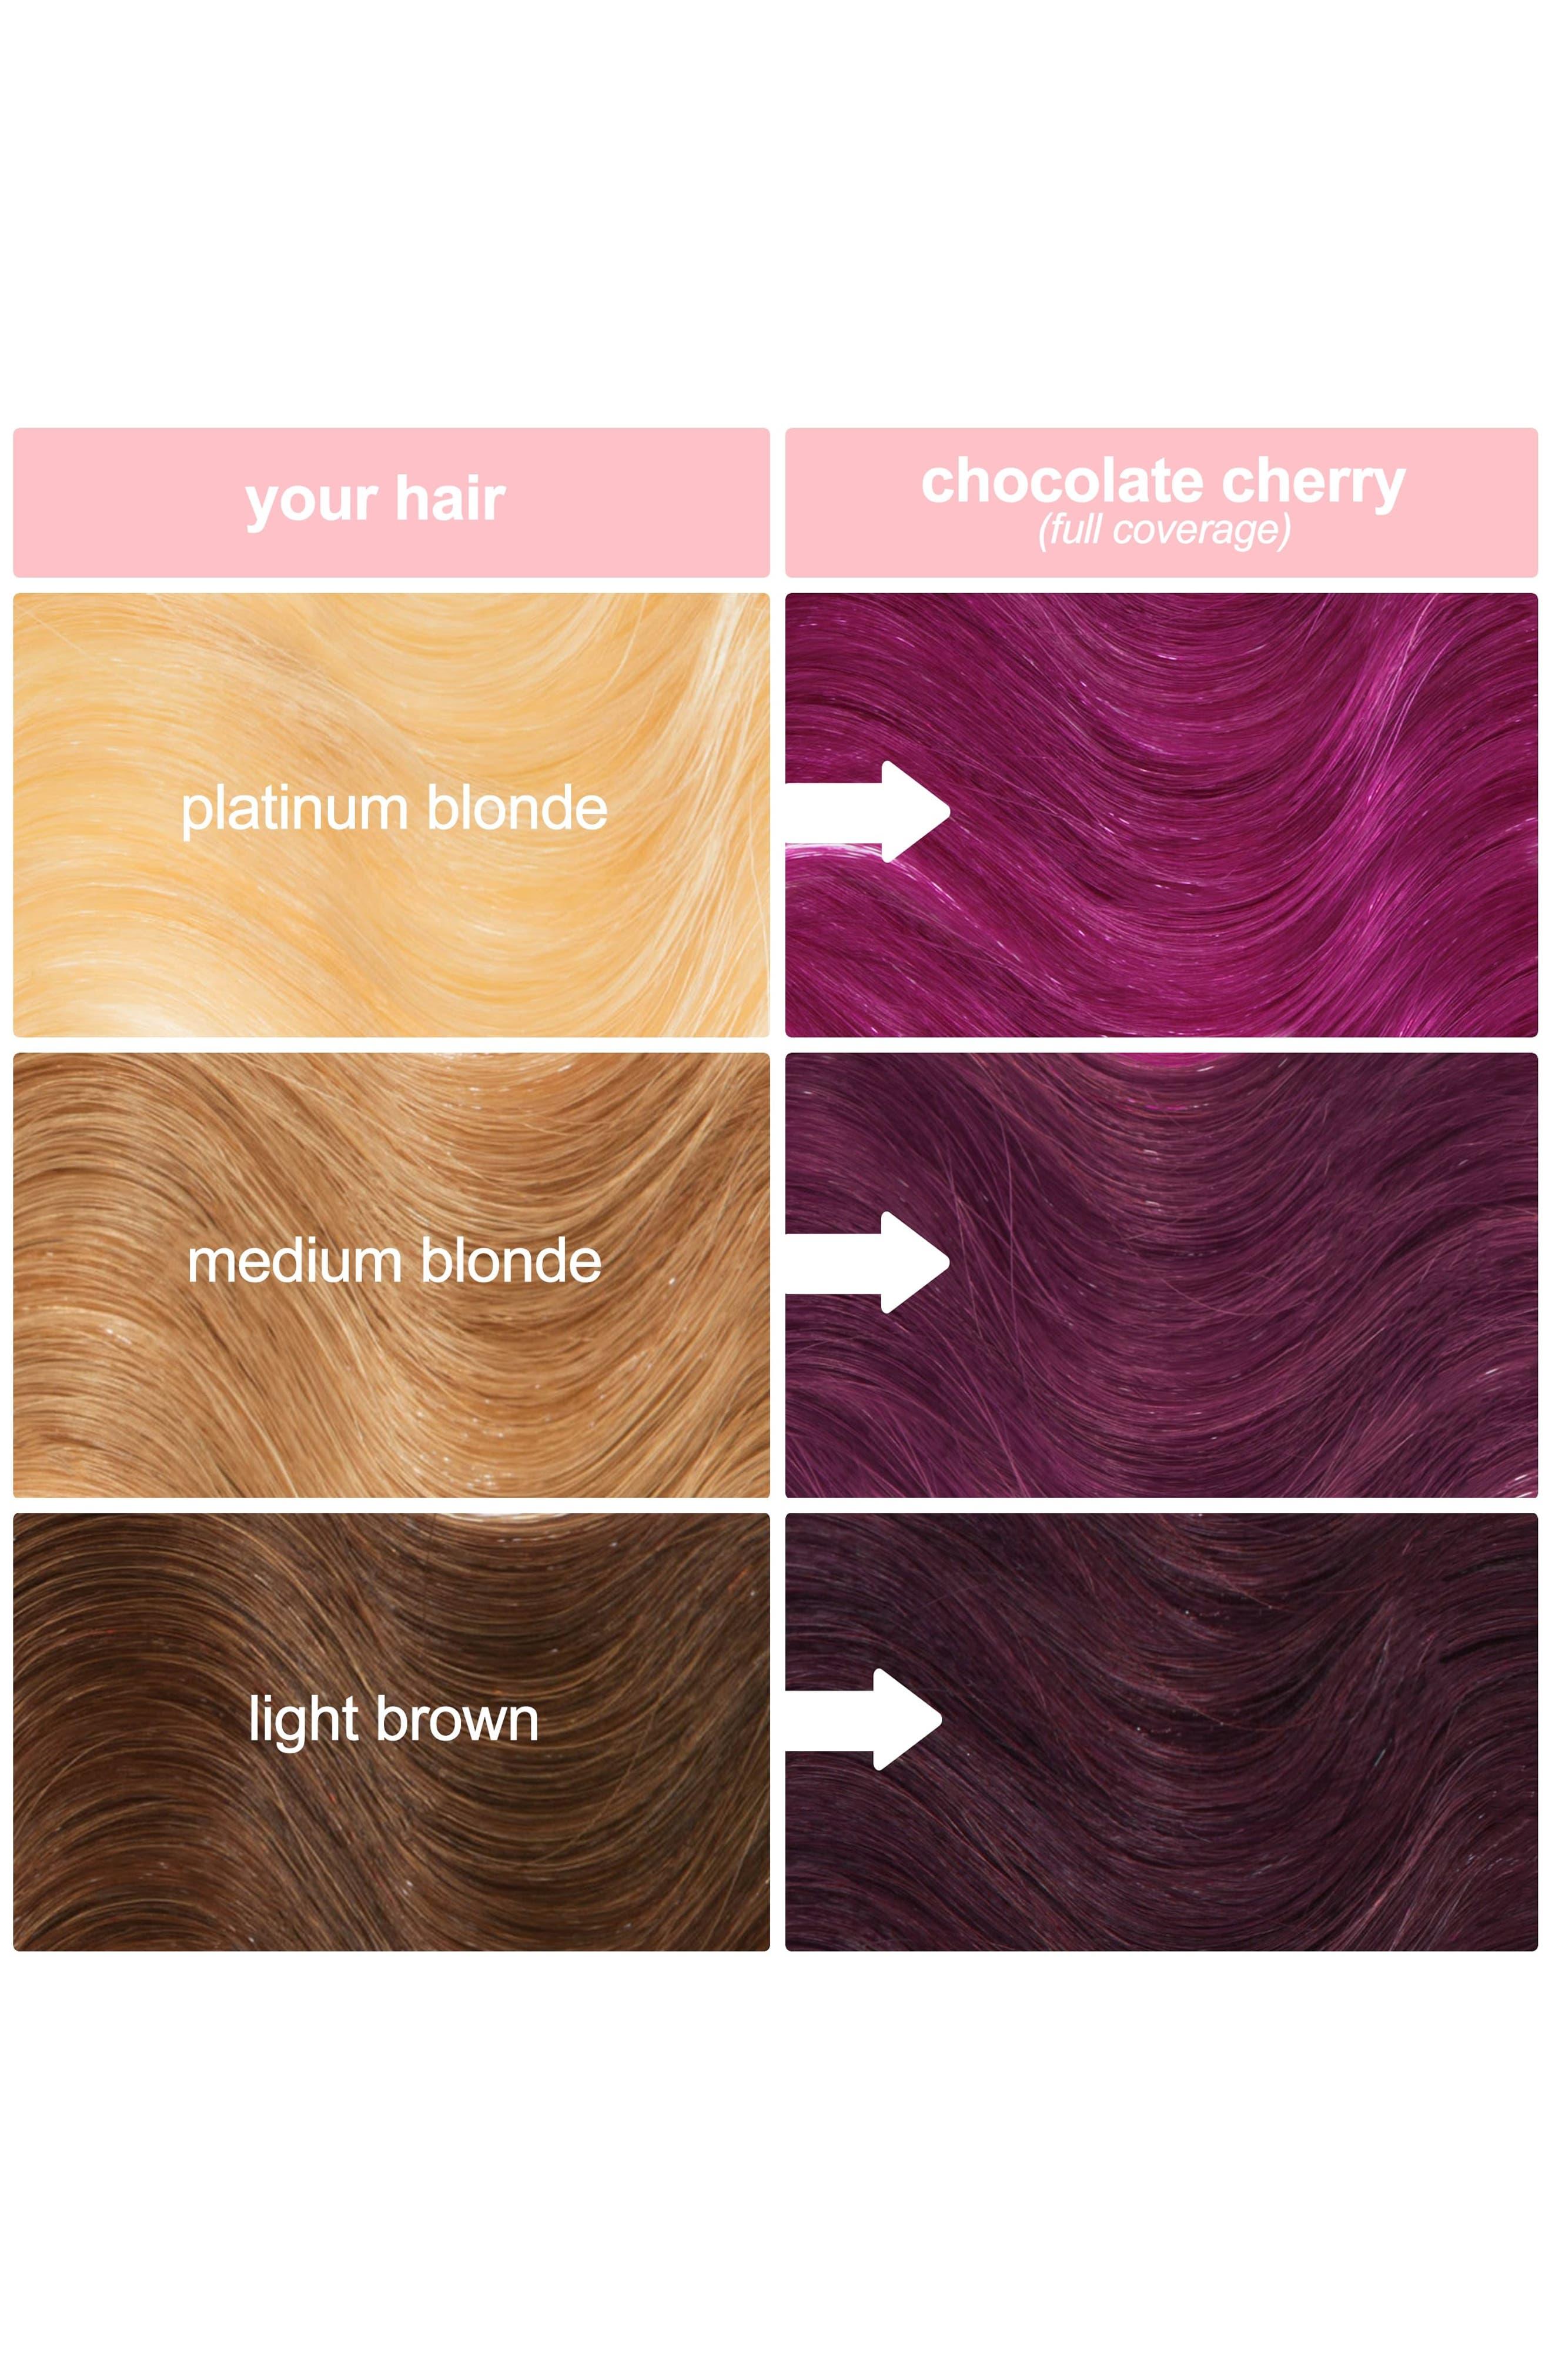 LIME CRIME, Unicorn Hair Full Coverage Semi-Permanent Hair Color, Alternate thumbnail 4, color, CHOCOLATE CHERRY